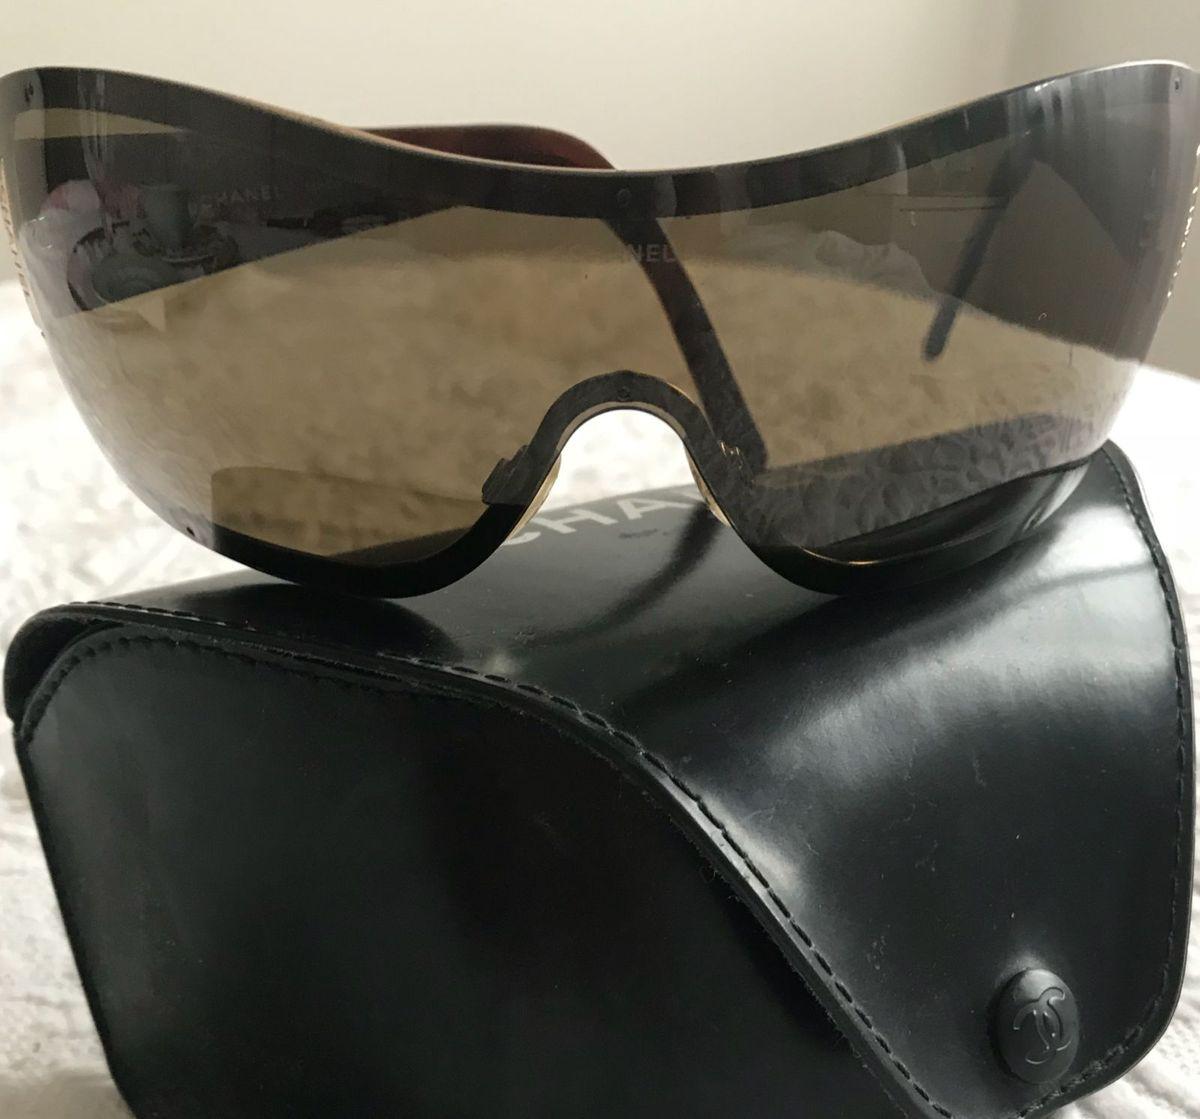 5e0e99846ddf3 óculos máscara chanel - óculos chanel.  Czm6ly9wag90b3muzw5qb2vplmnvbs5ici9wcm9kdwn0cy82mjgxnjq1l2nkmmviogjhngu0mwnkmtfkntmymjgwodmym2ezzti5lmpwzw  ...